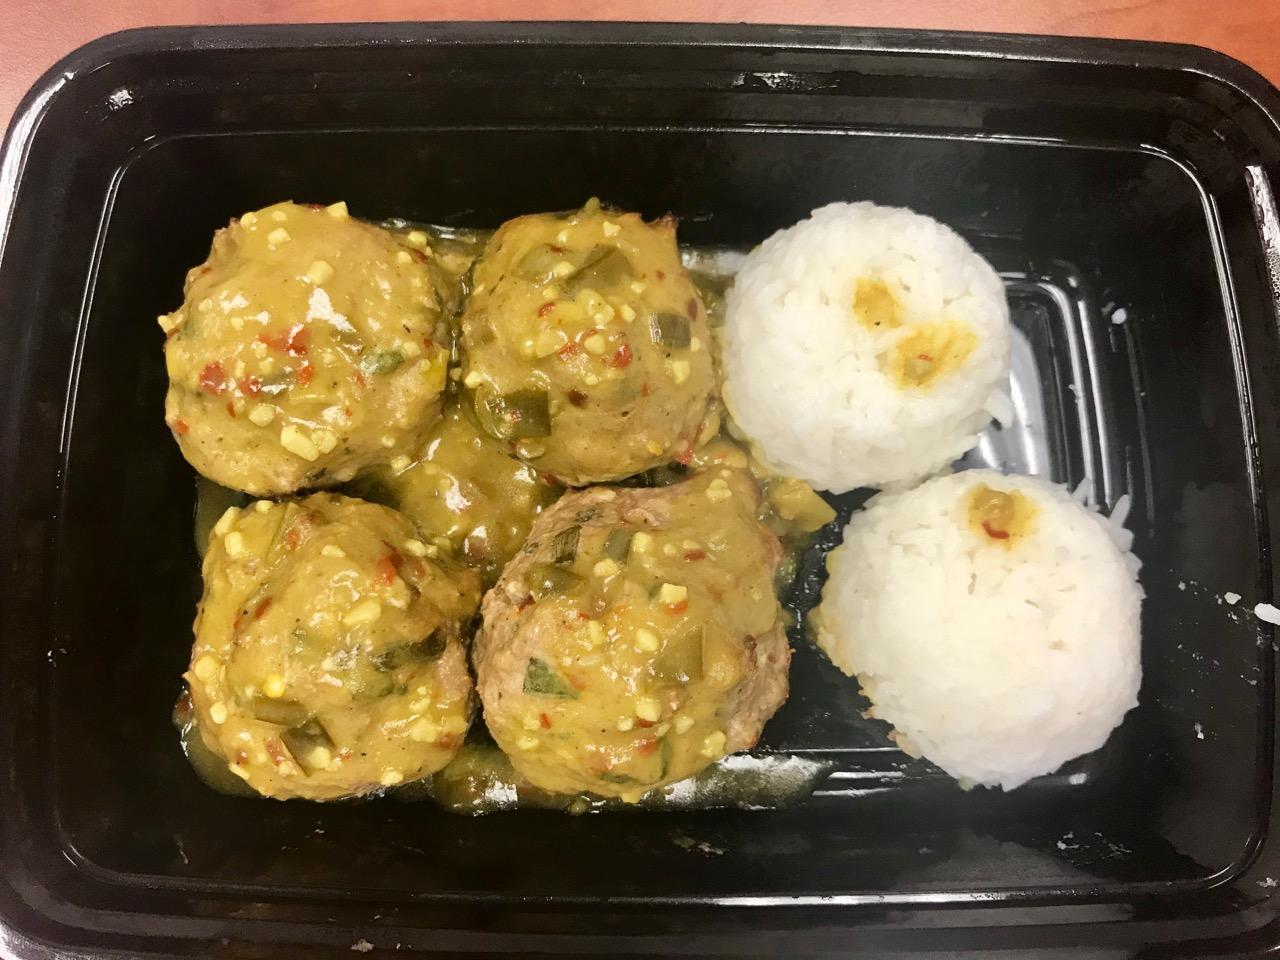 Thai Turkey Meatballs with Jasmine Rice - May 23 2018